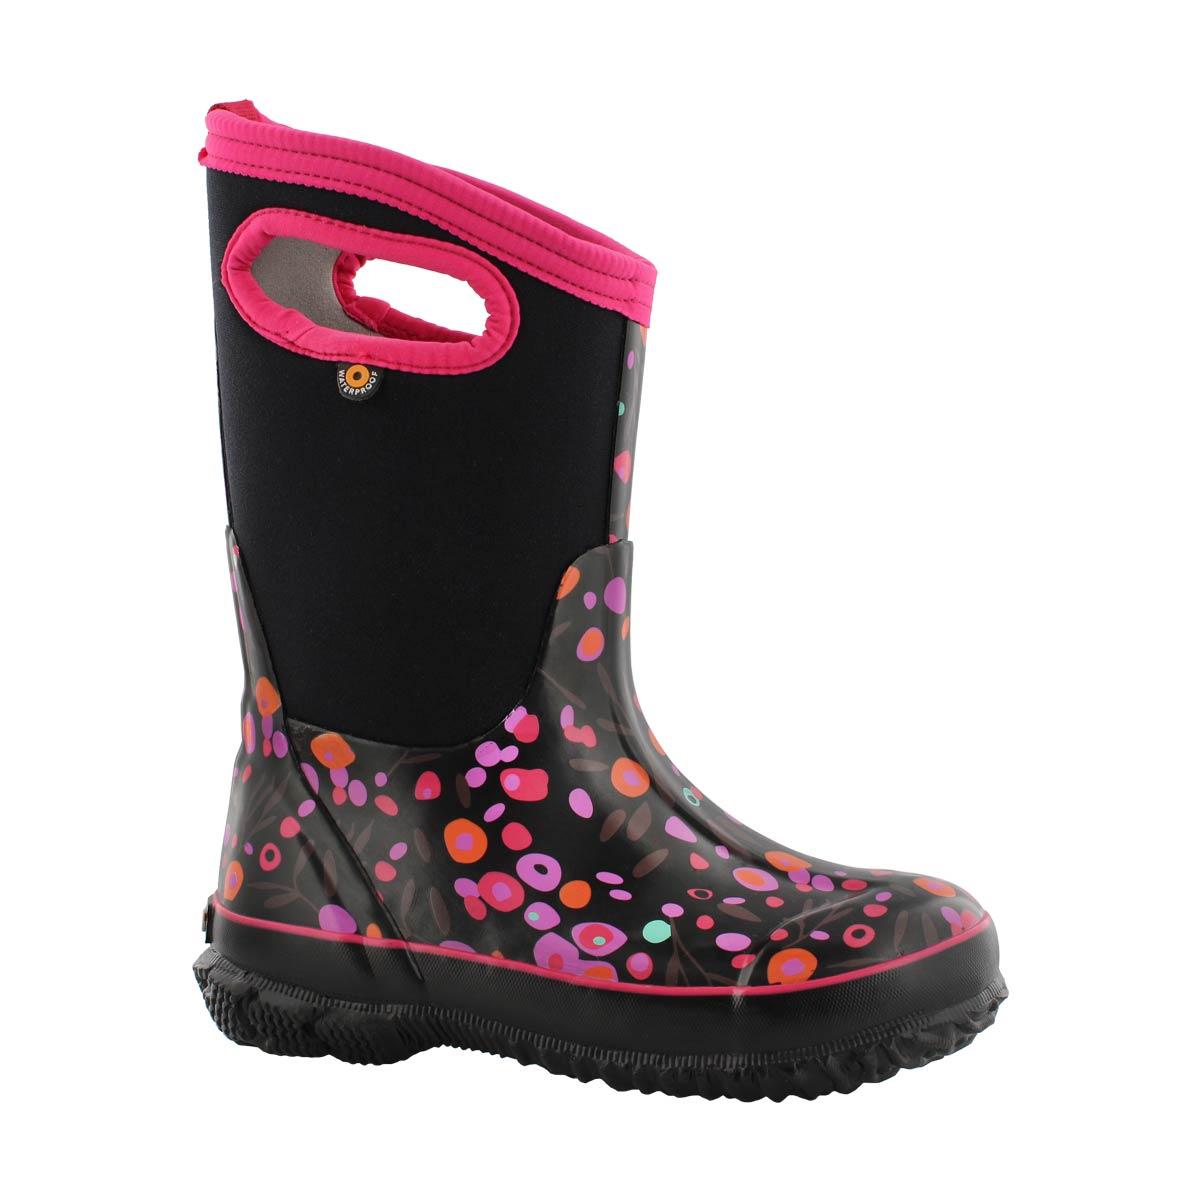 Girls' CLASSIC CATTAIL blk multi waterproof boots